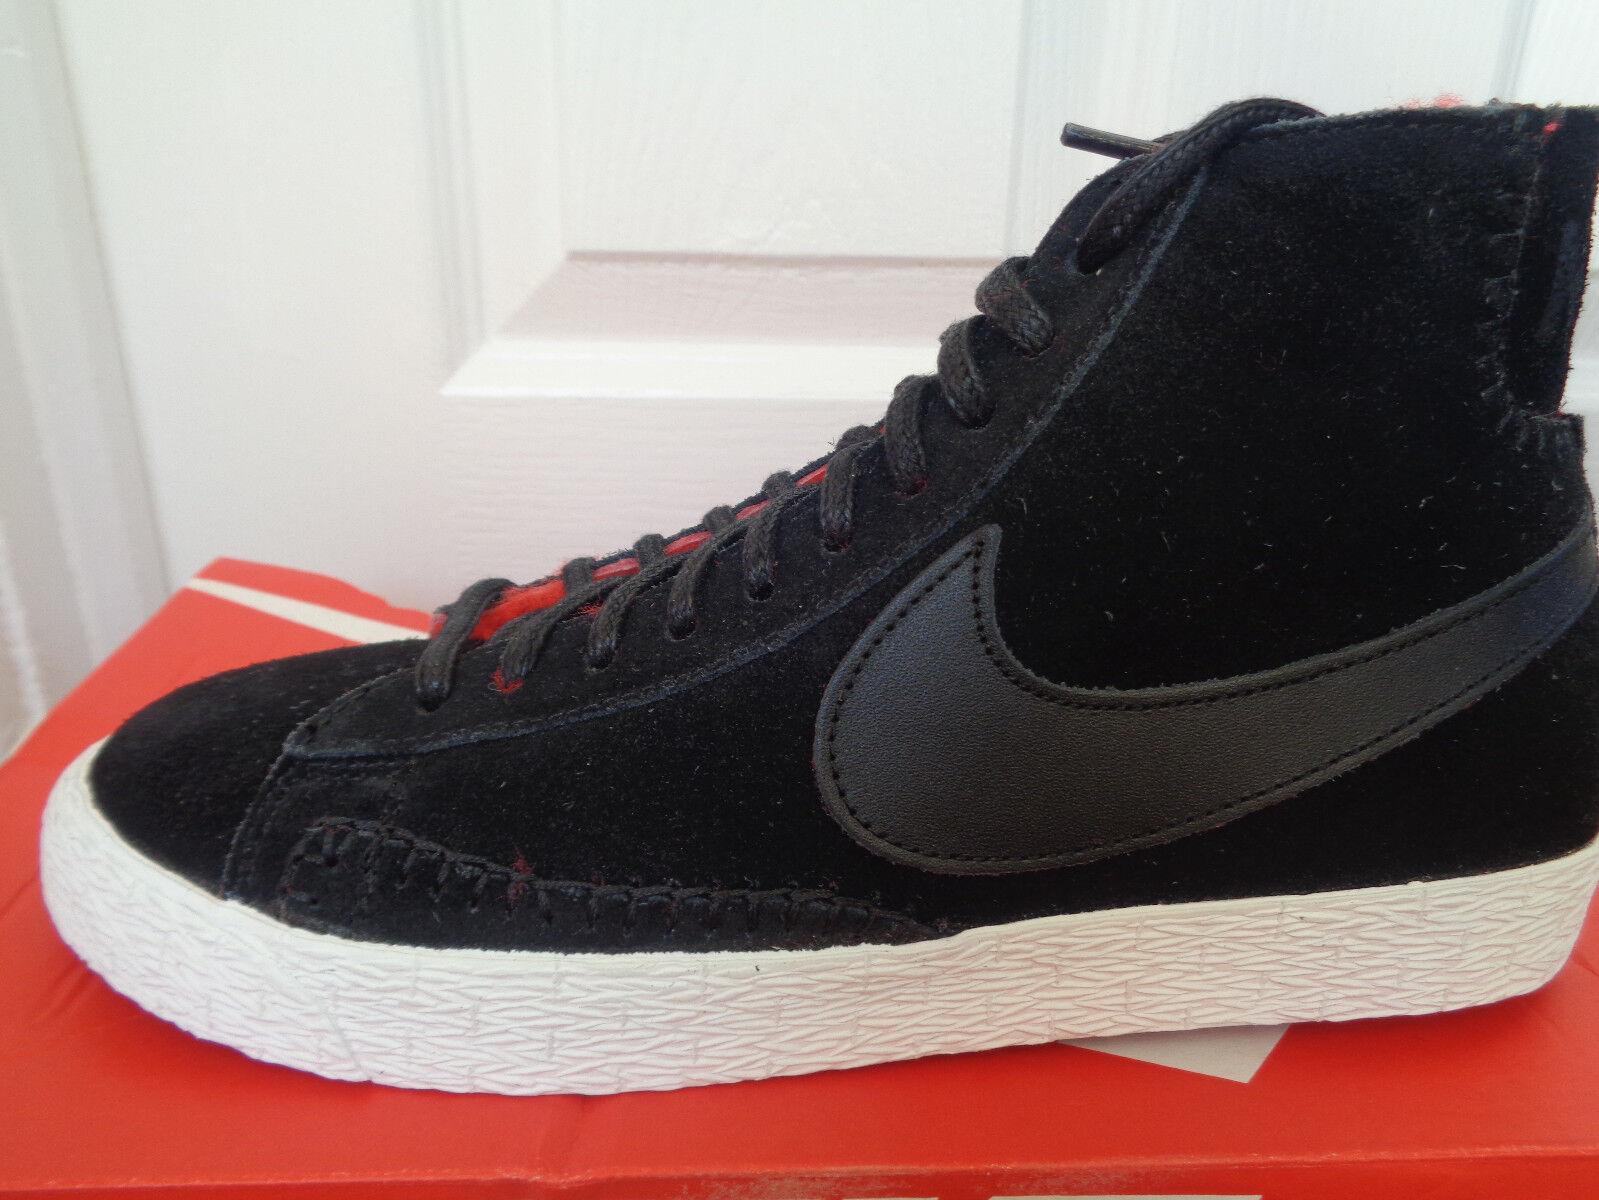 Spezialangebot Nike Air Max Command Prm Low Schuhe Herren